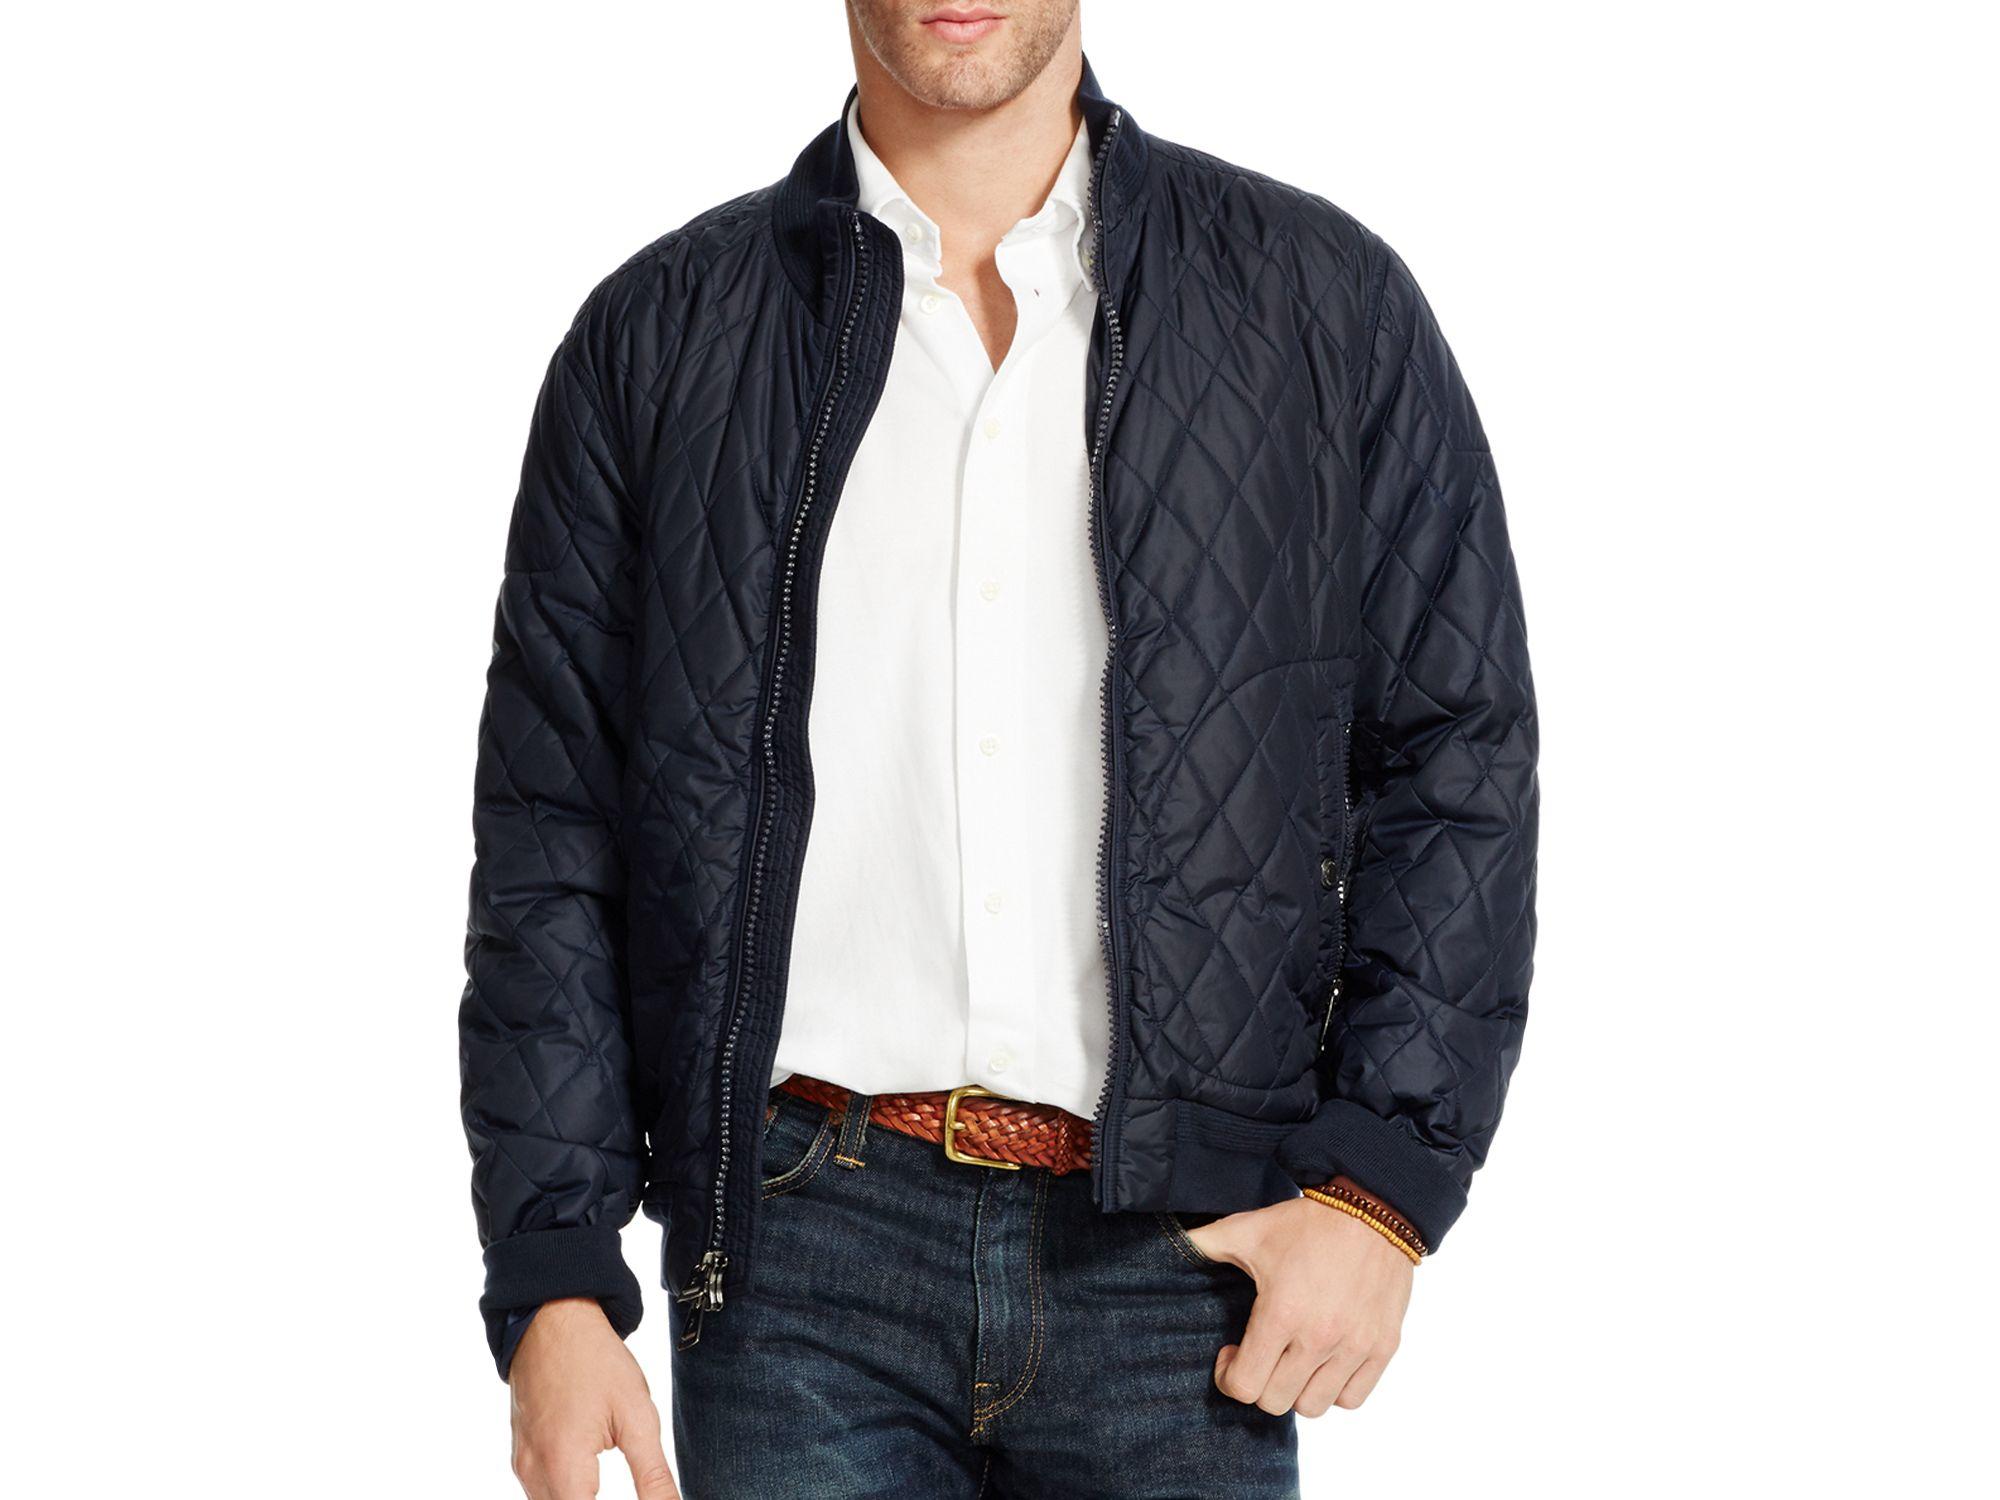 Lyst Polo Ralph Lauren Quilted Nylon Bomber Jacket In Black For Men